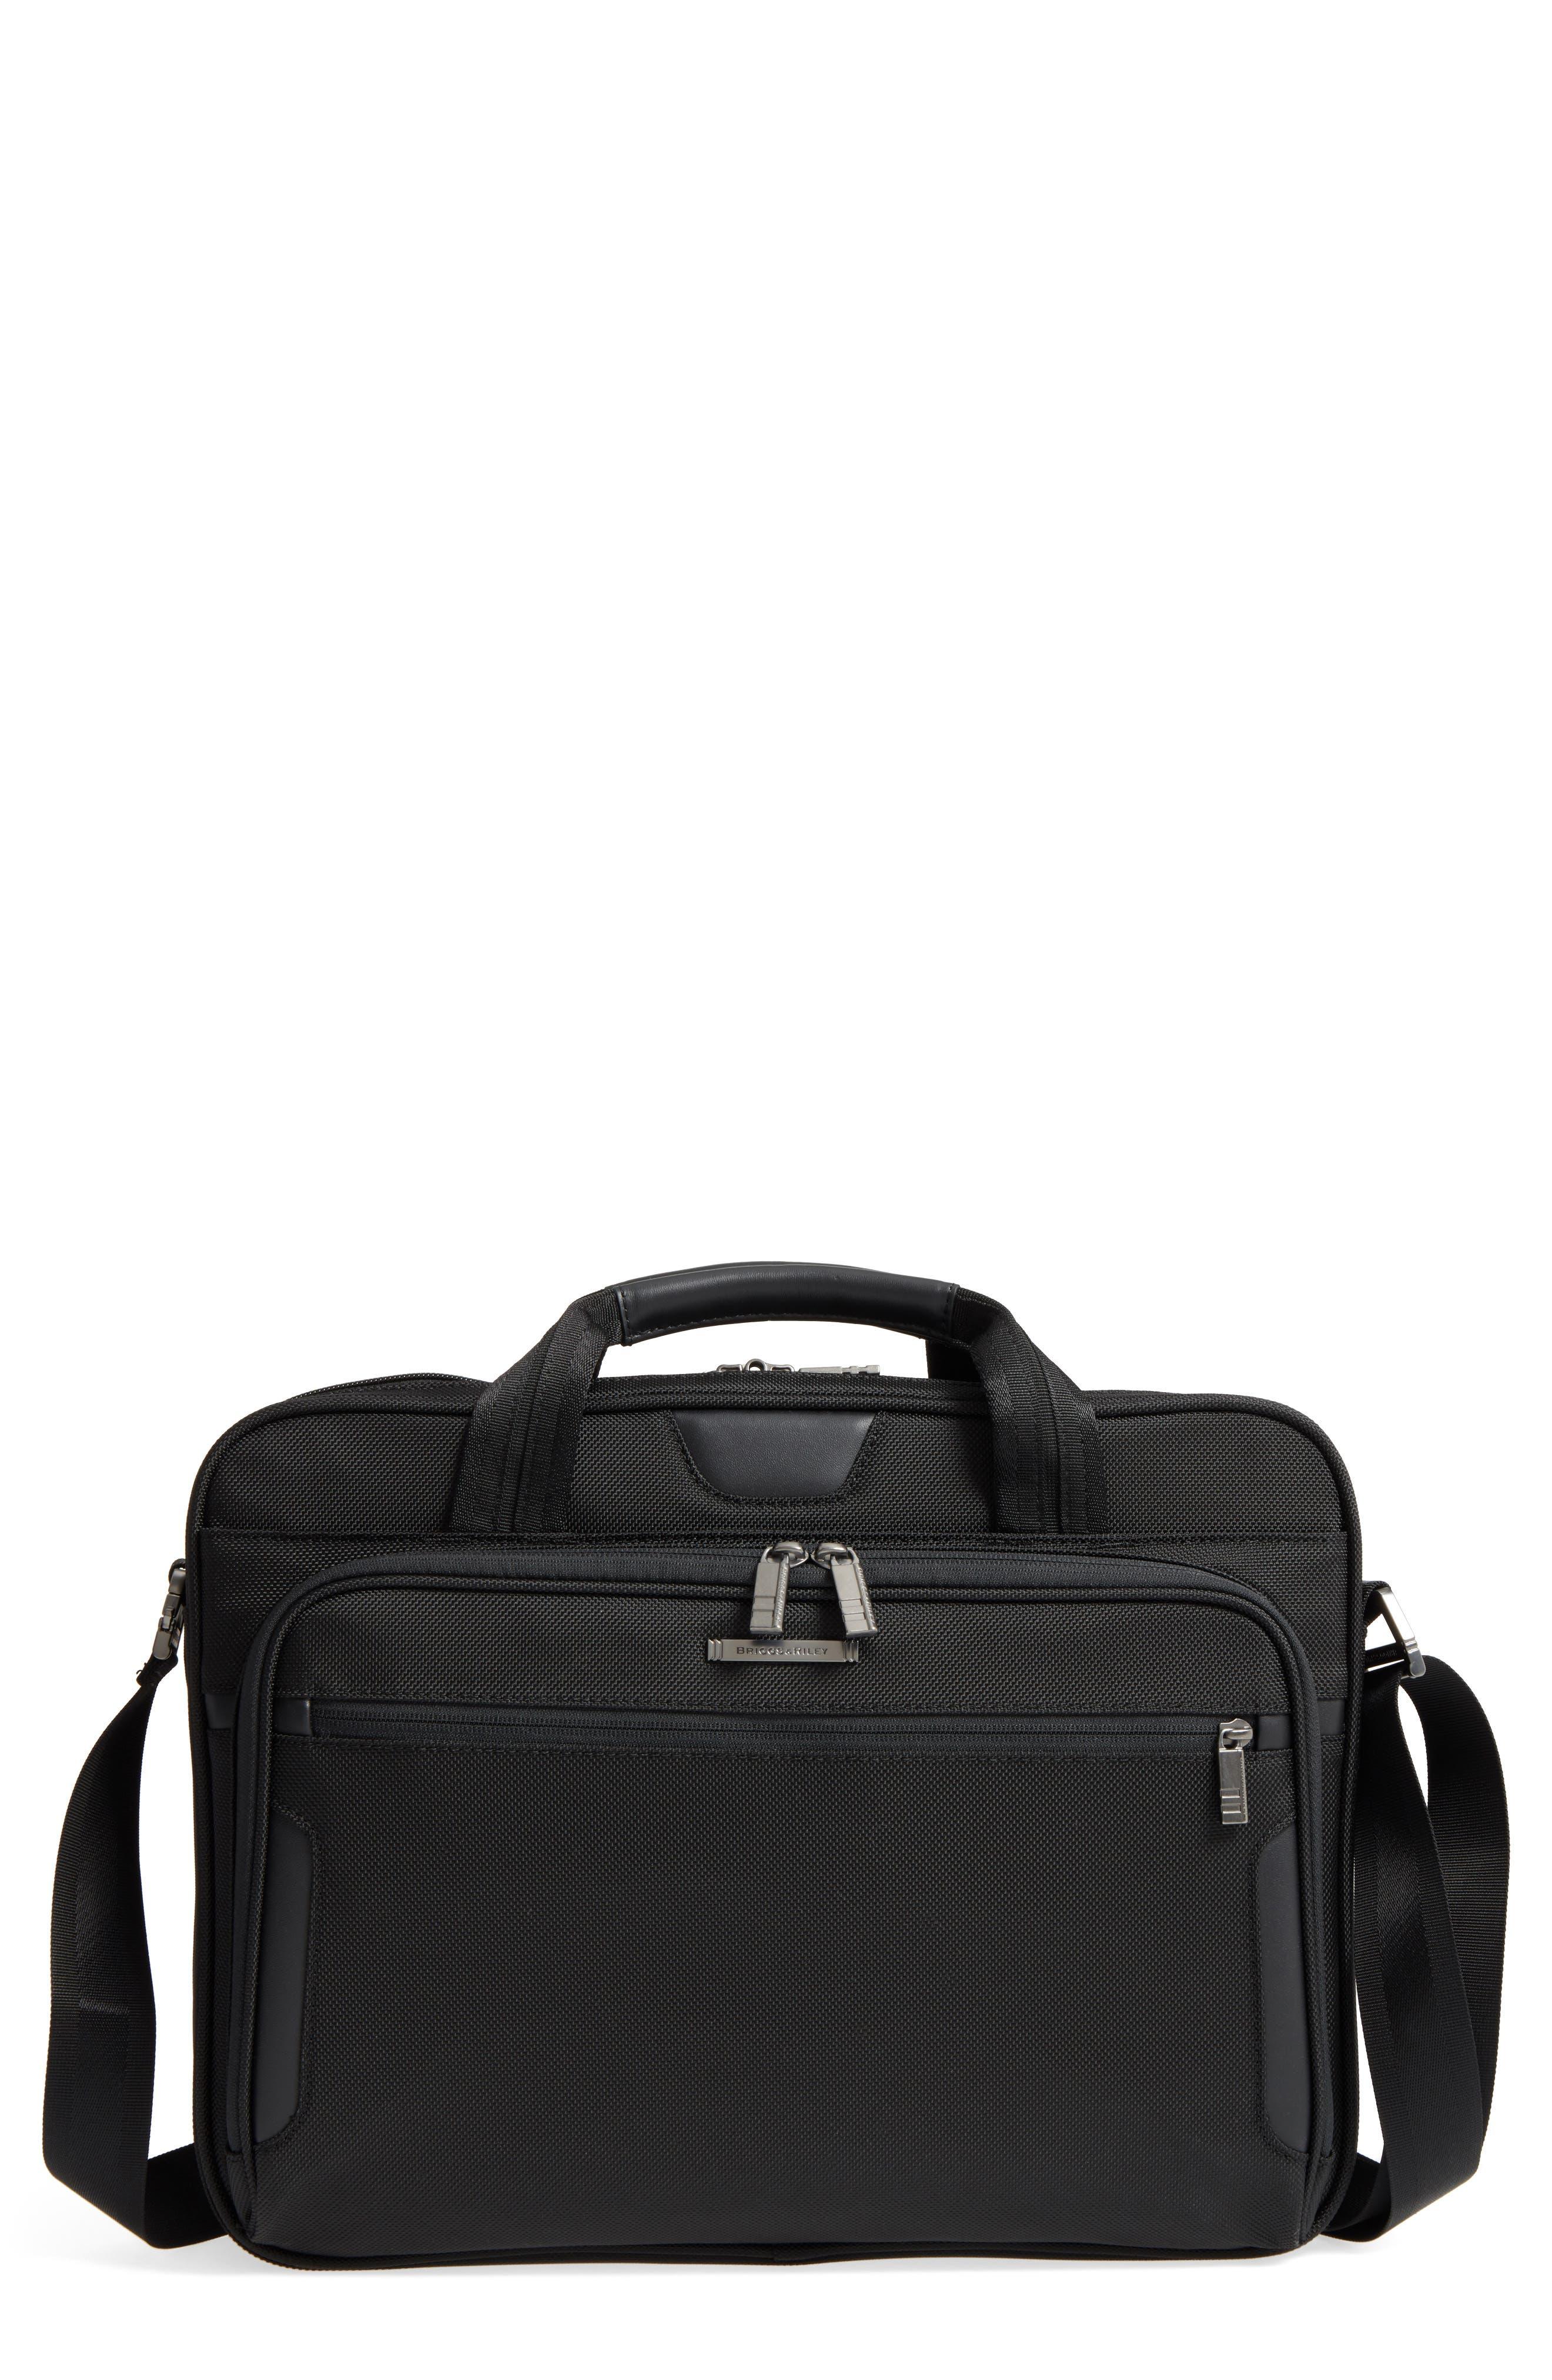 'Medium' Ballistic Nylon Briefcase,                             Main thumbnail 1, color,                             Black